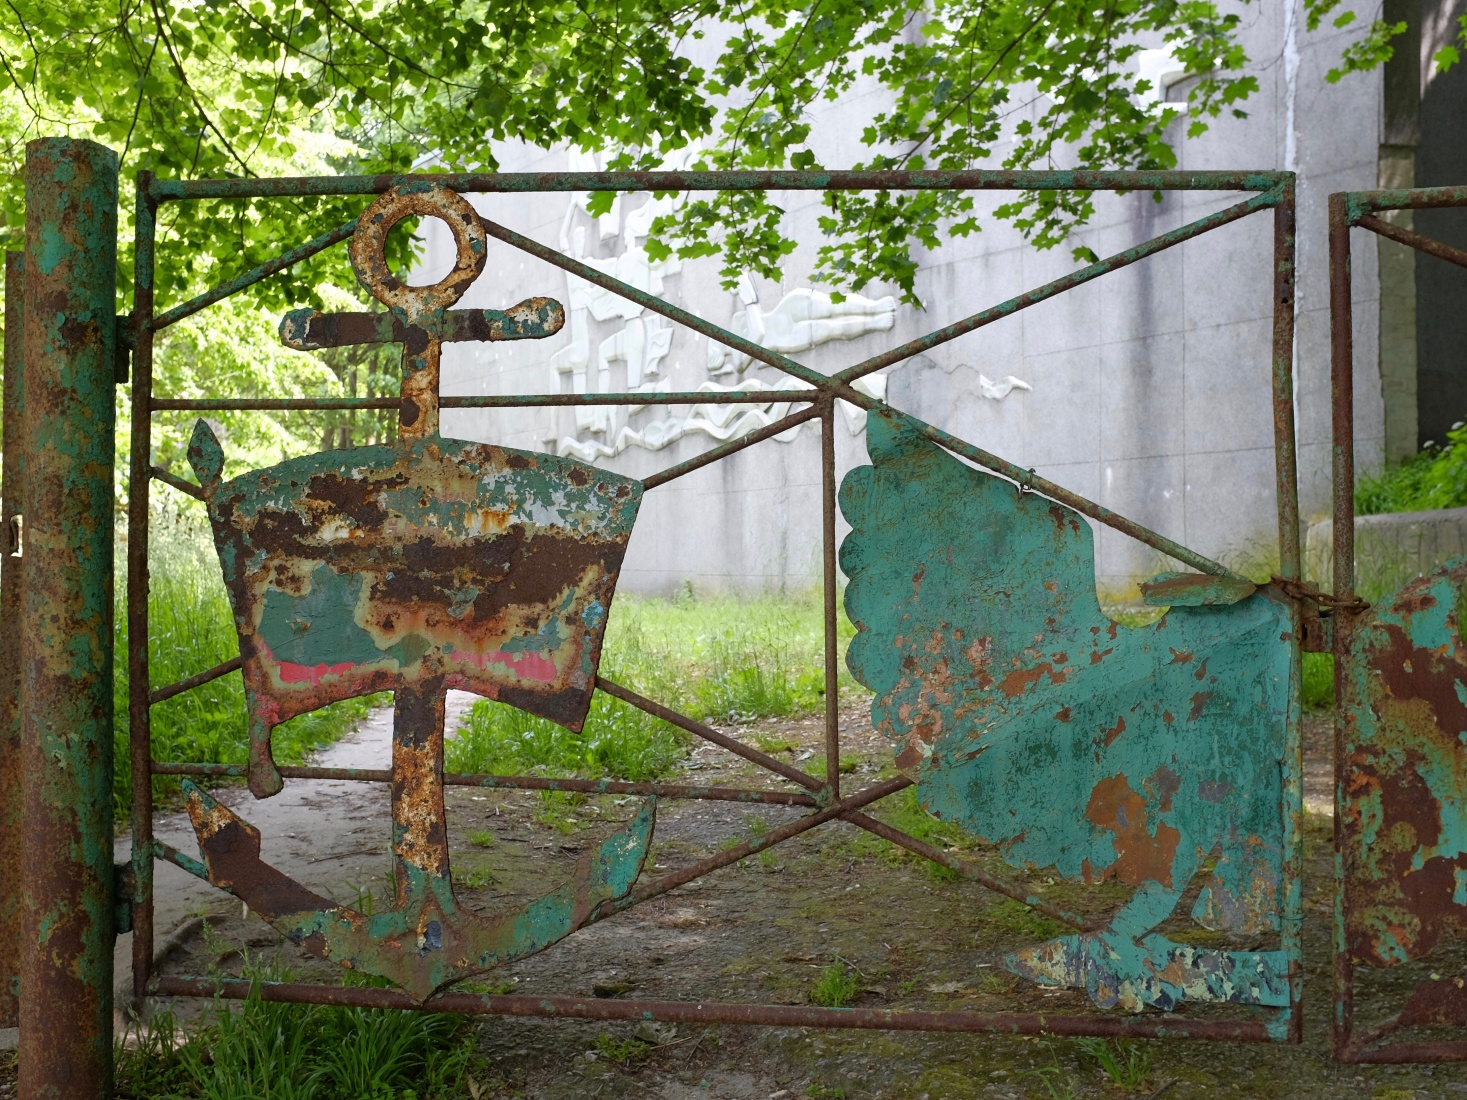 Abandoned Soviet club or restaurant in the spa town of Svetlogorsk, near Kaliningrad, Russia.